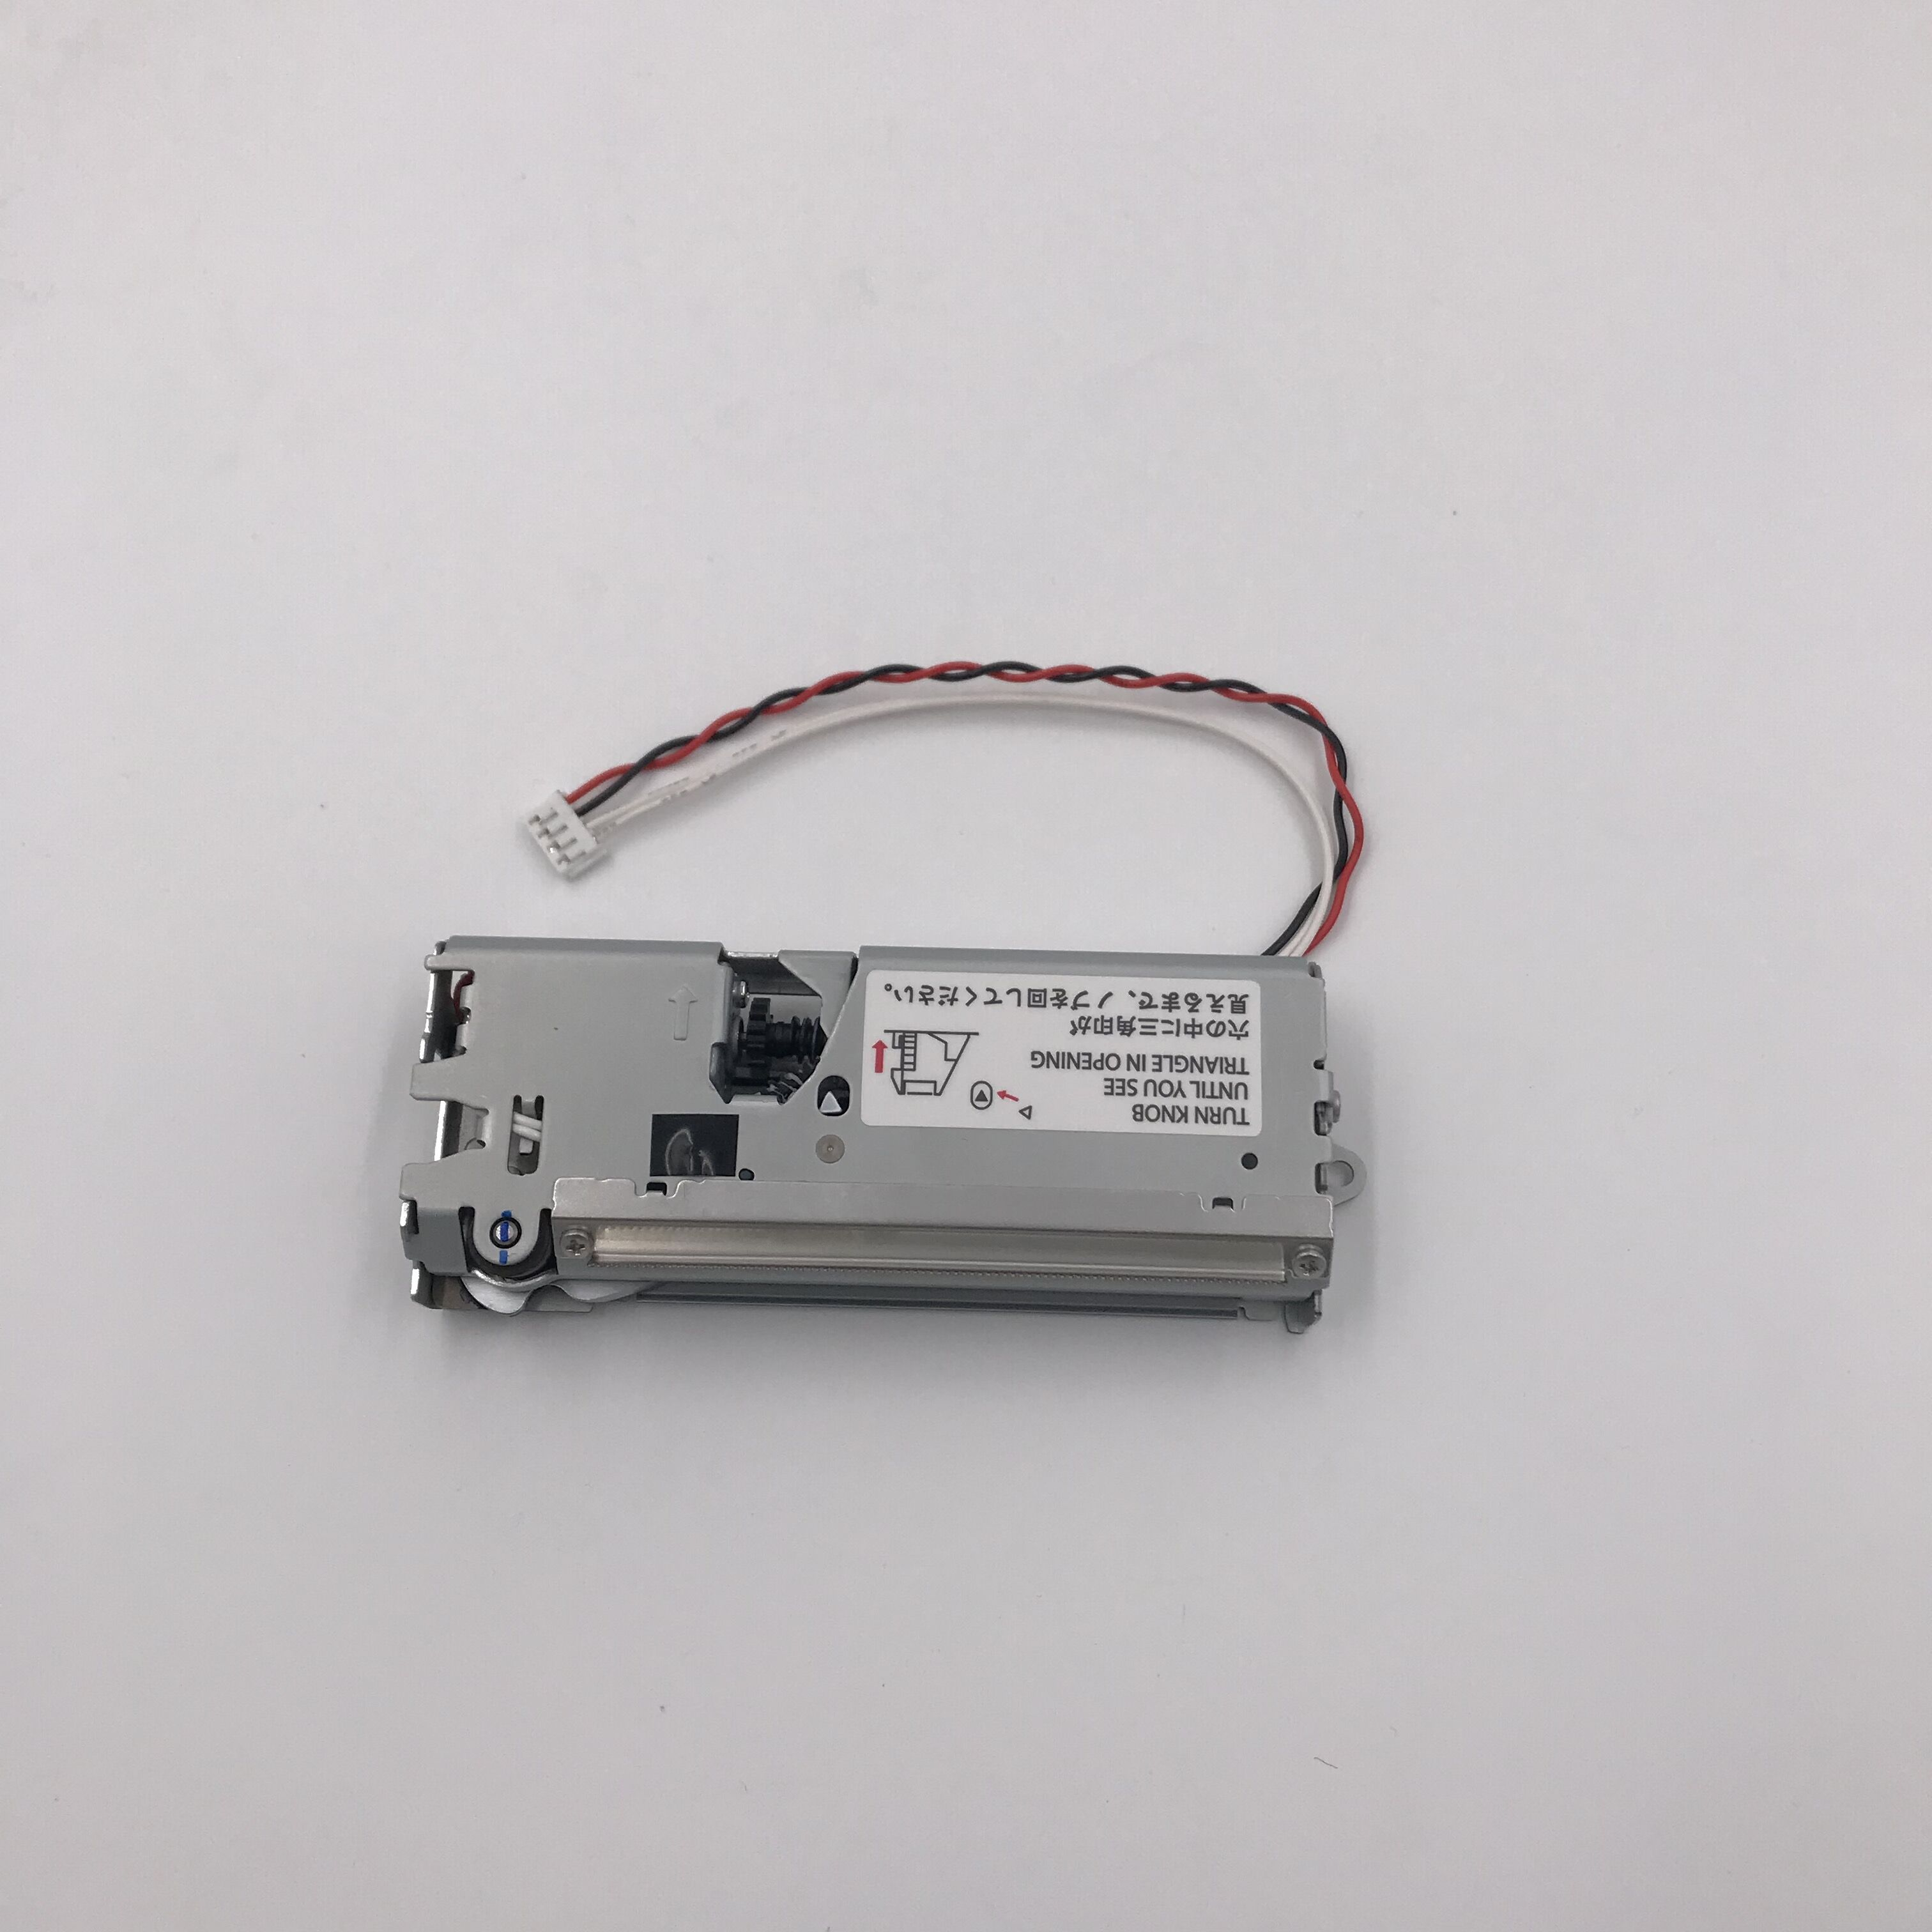 New original cutter unit fit for Epson TM-T88V printer